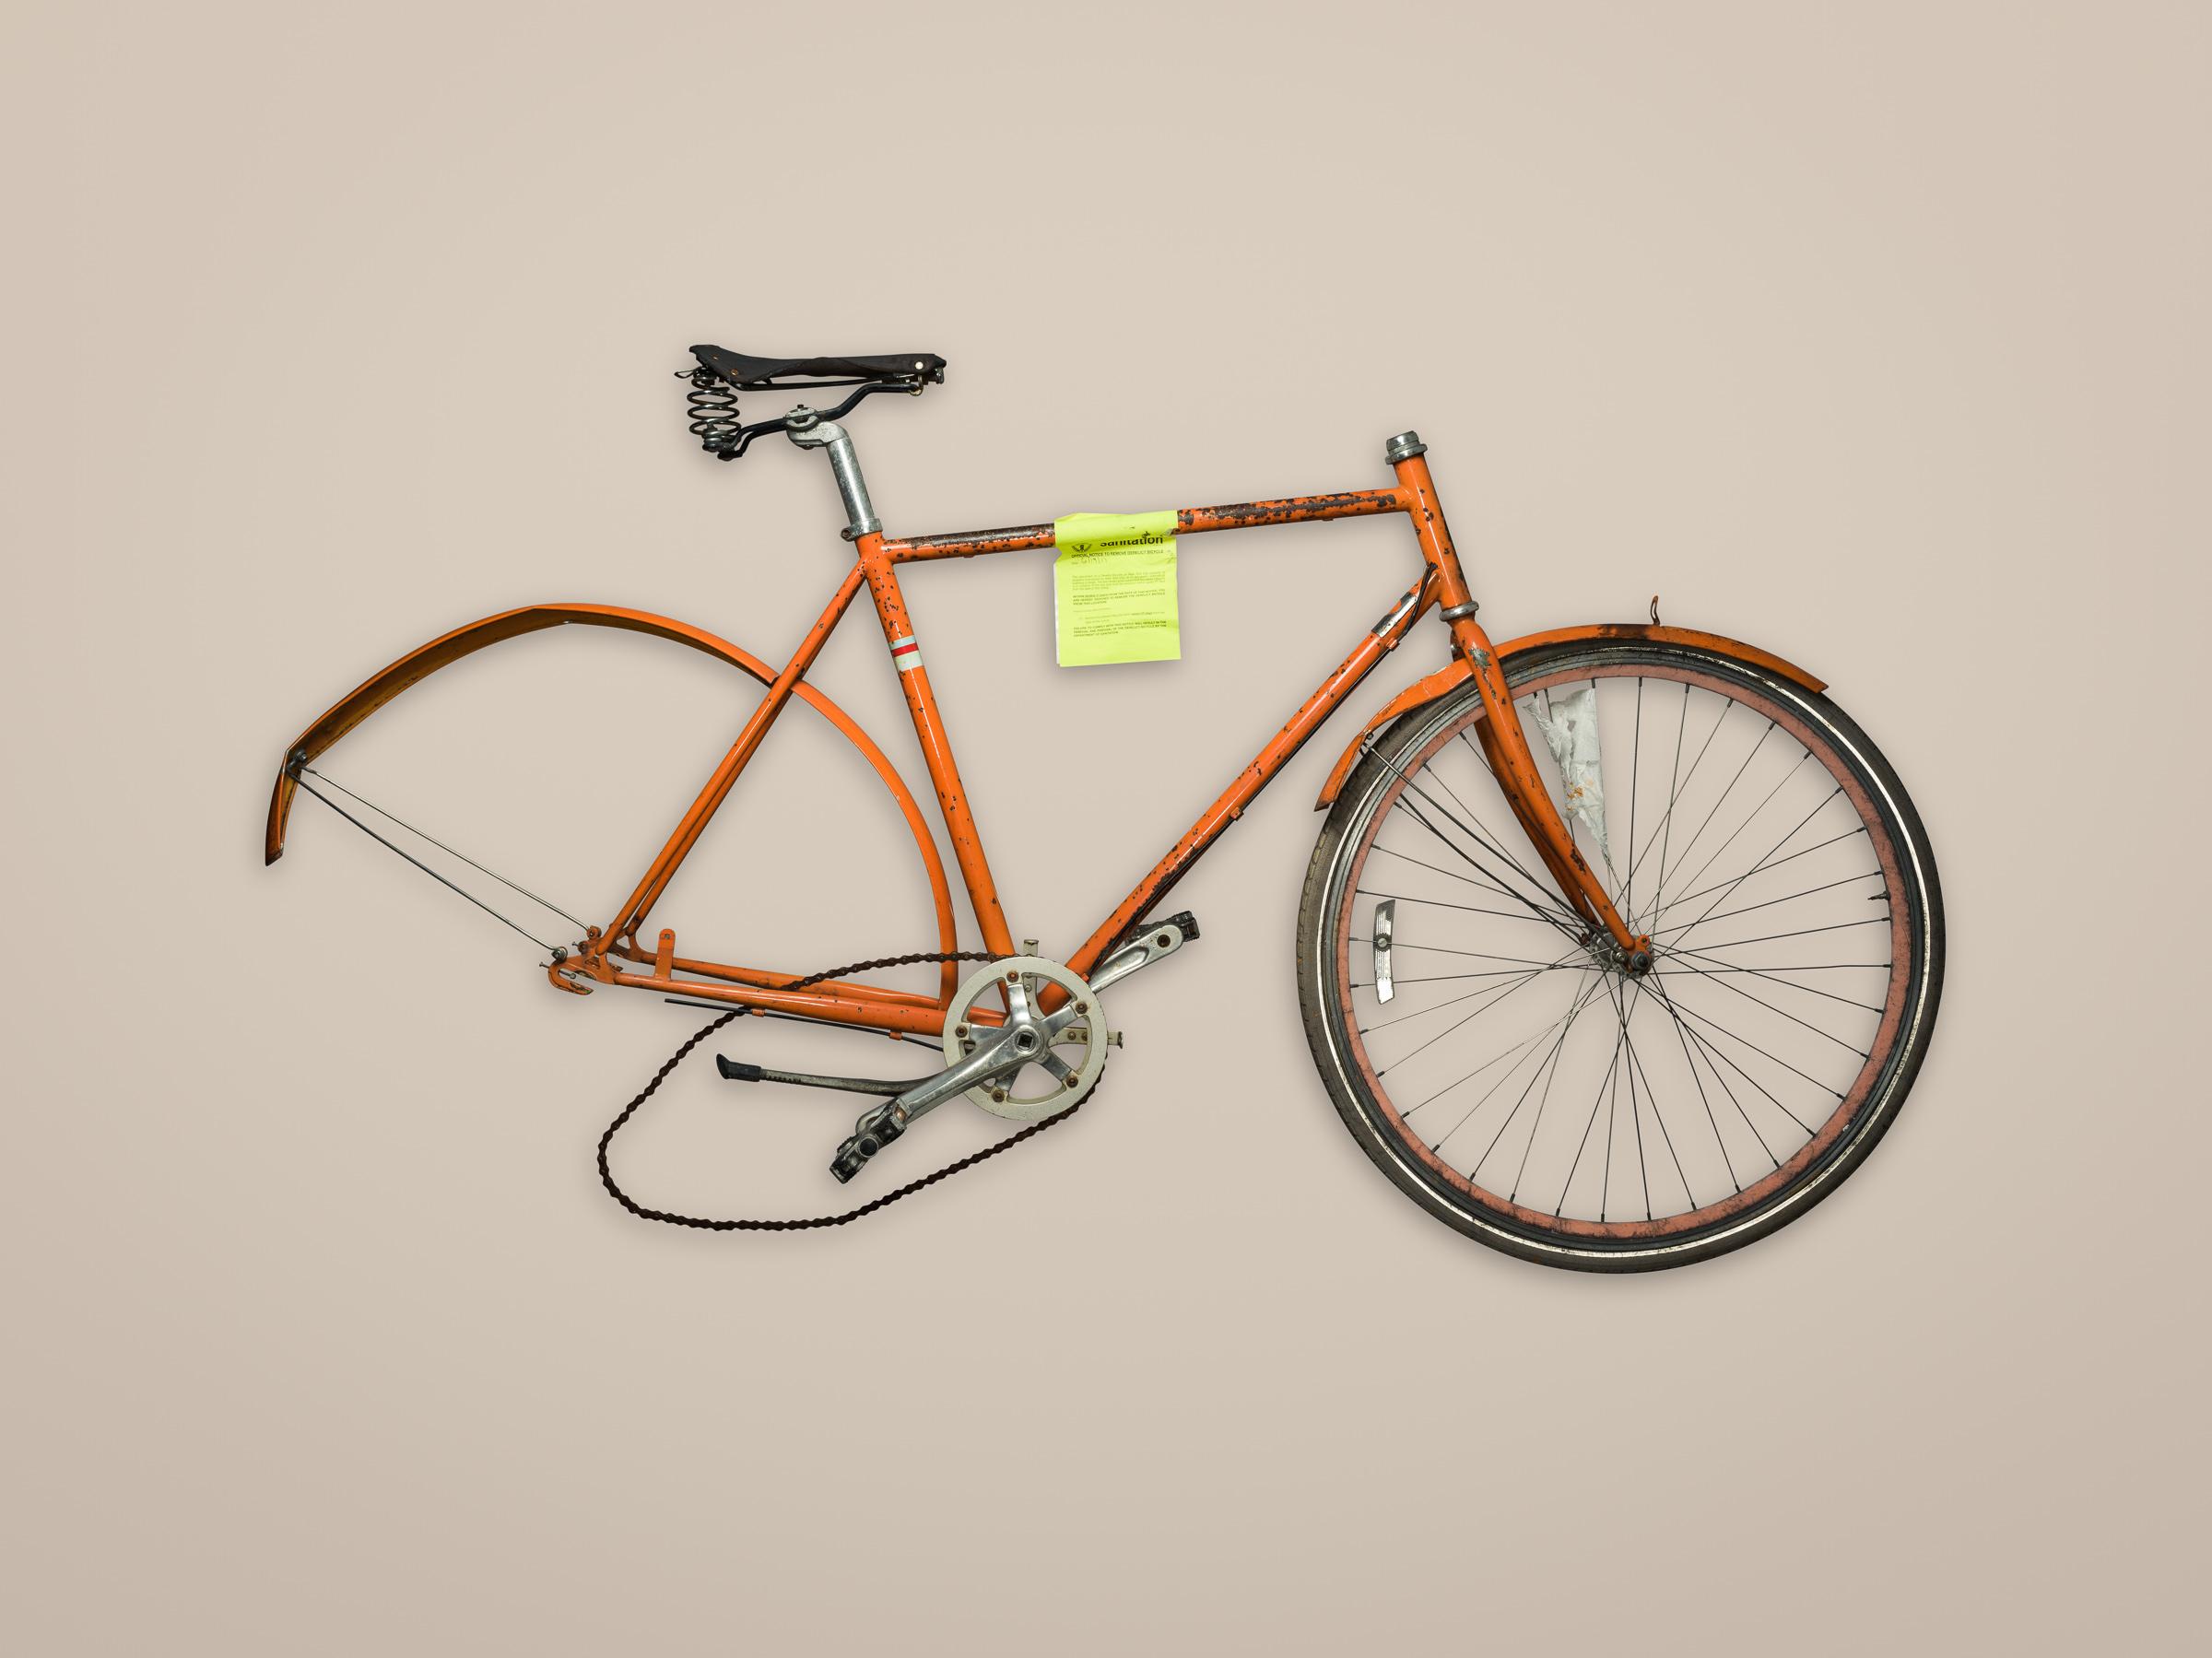 John_Mireles-Abandoned-Bike-1108.jpg